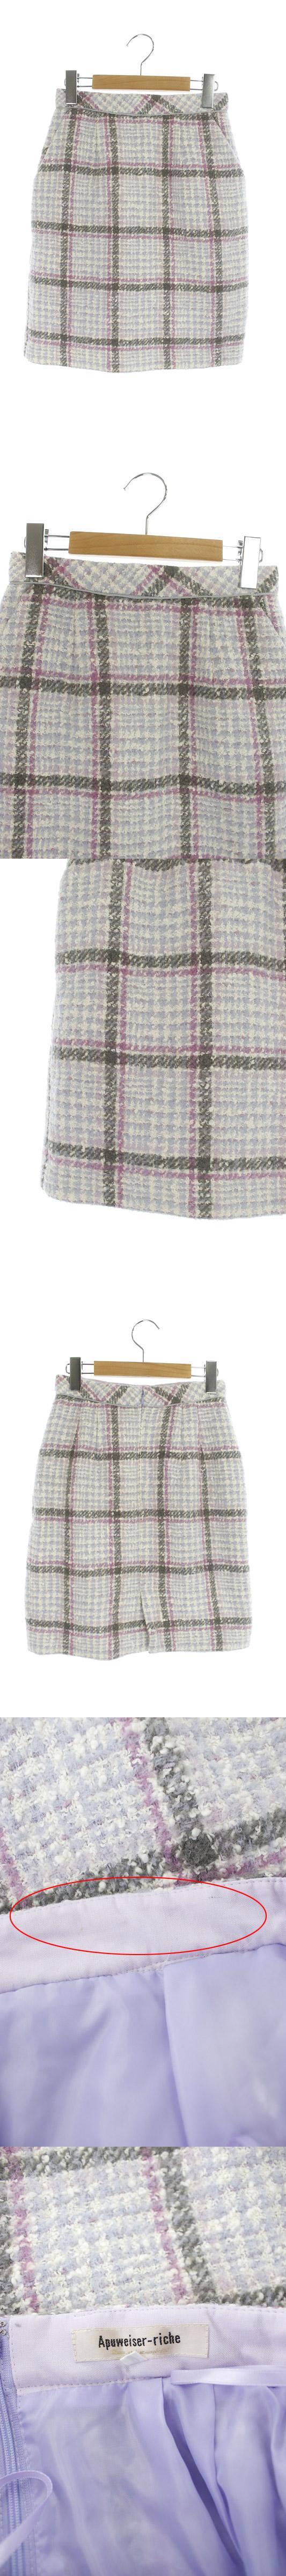 17AW スカート タイト 膝丈 パステルチェック 1 水色 白 紫 /AO ■OS